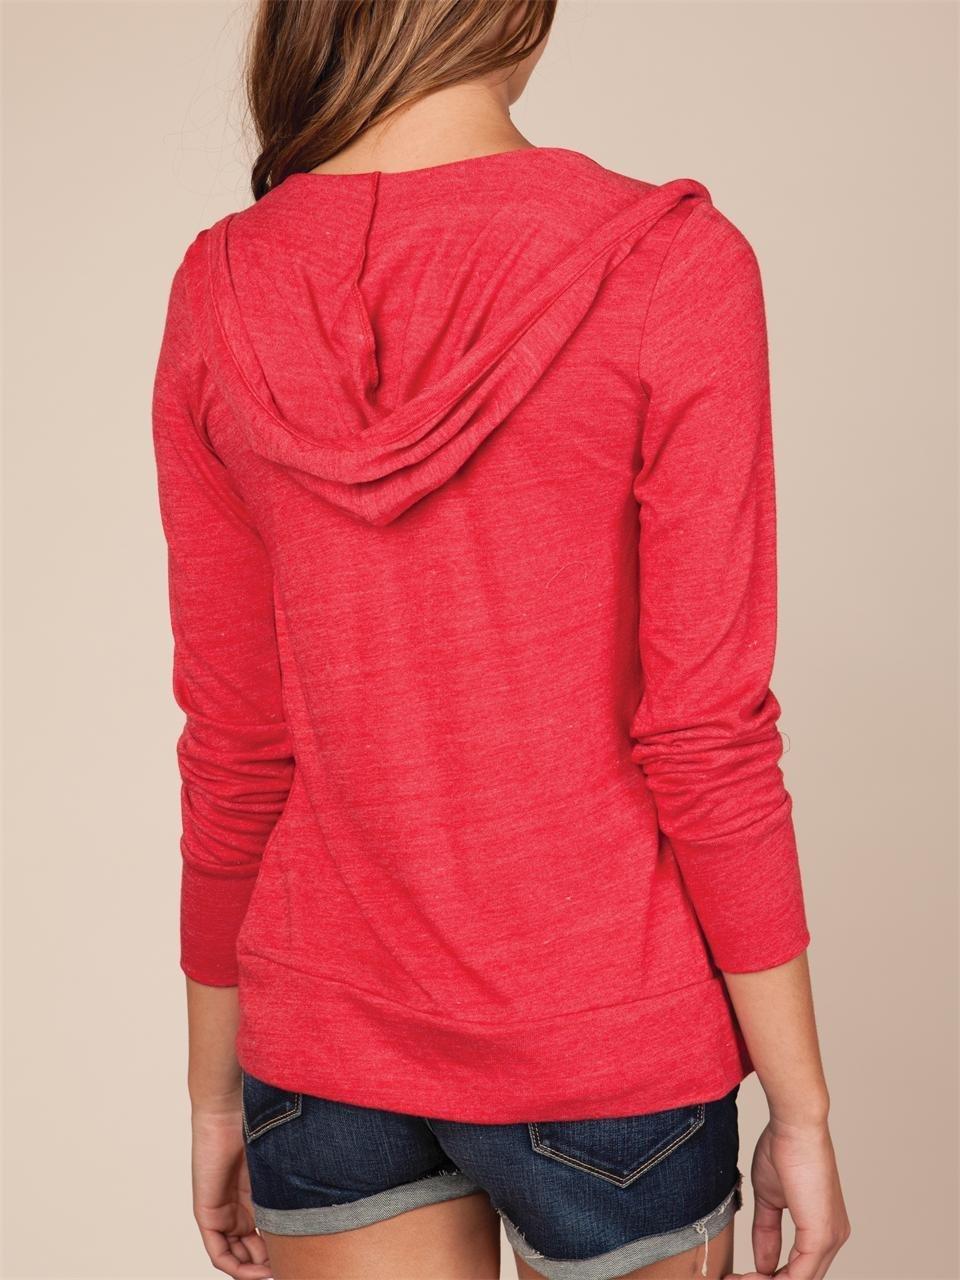 Lyst - Alternative Apparel Womens Ecoheather Zip Hoodie in Red dde5ea9092